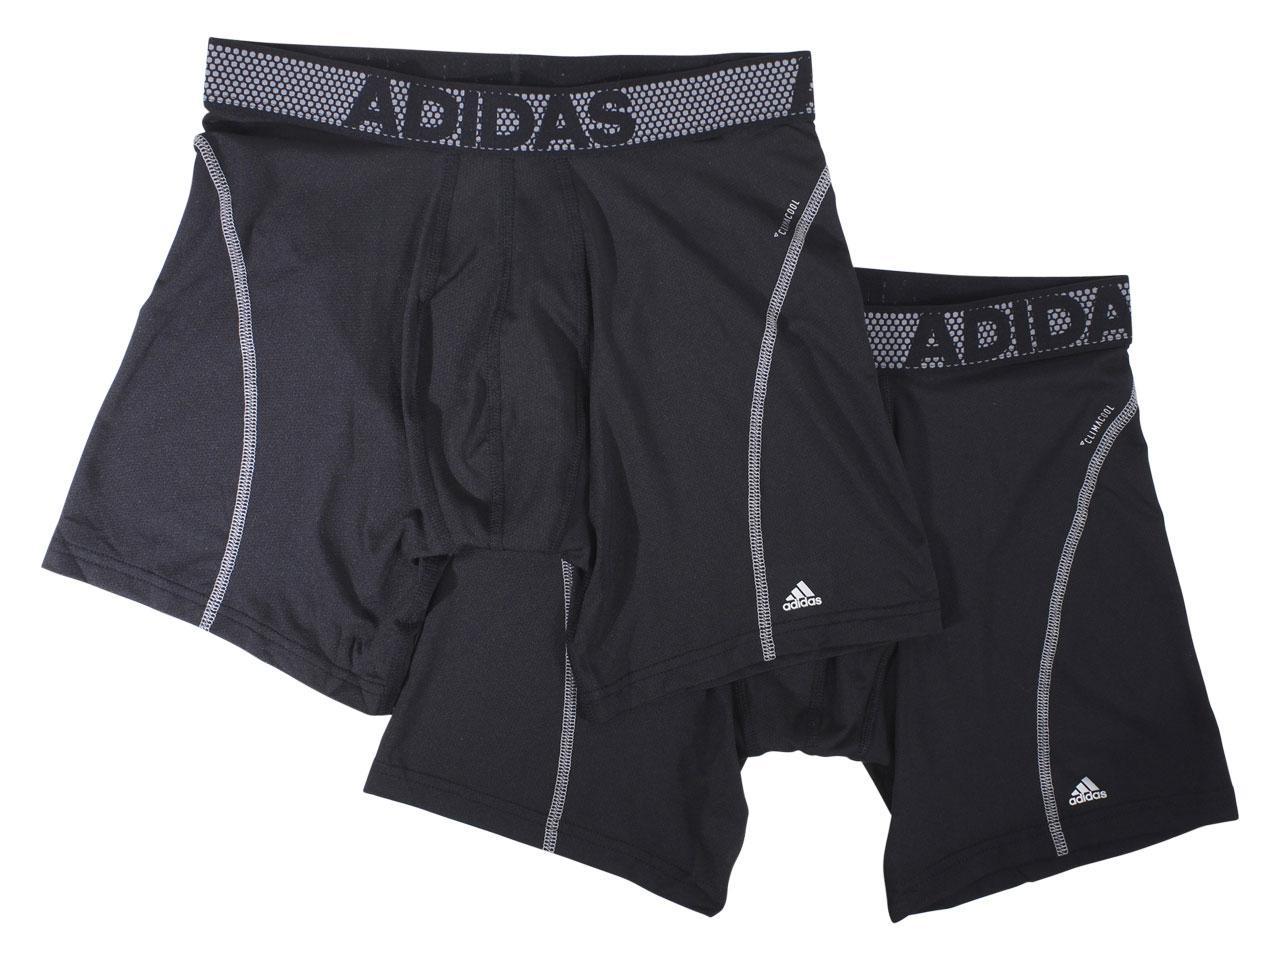 Adidas Men's 2-Pc Sport Performance Climacool Boxer Briefs Underwear